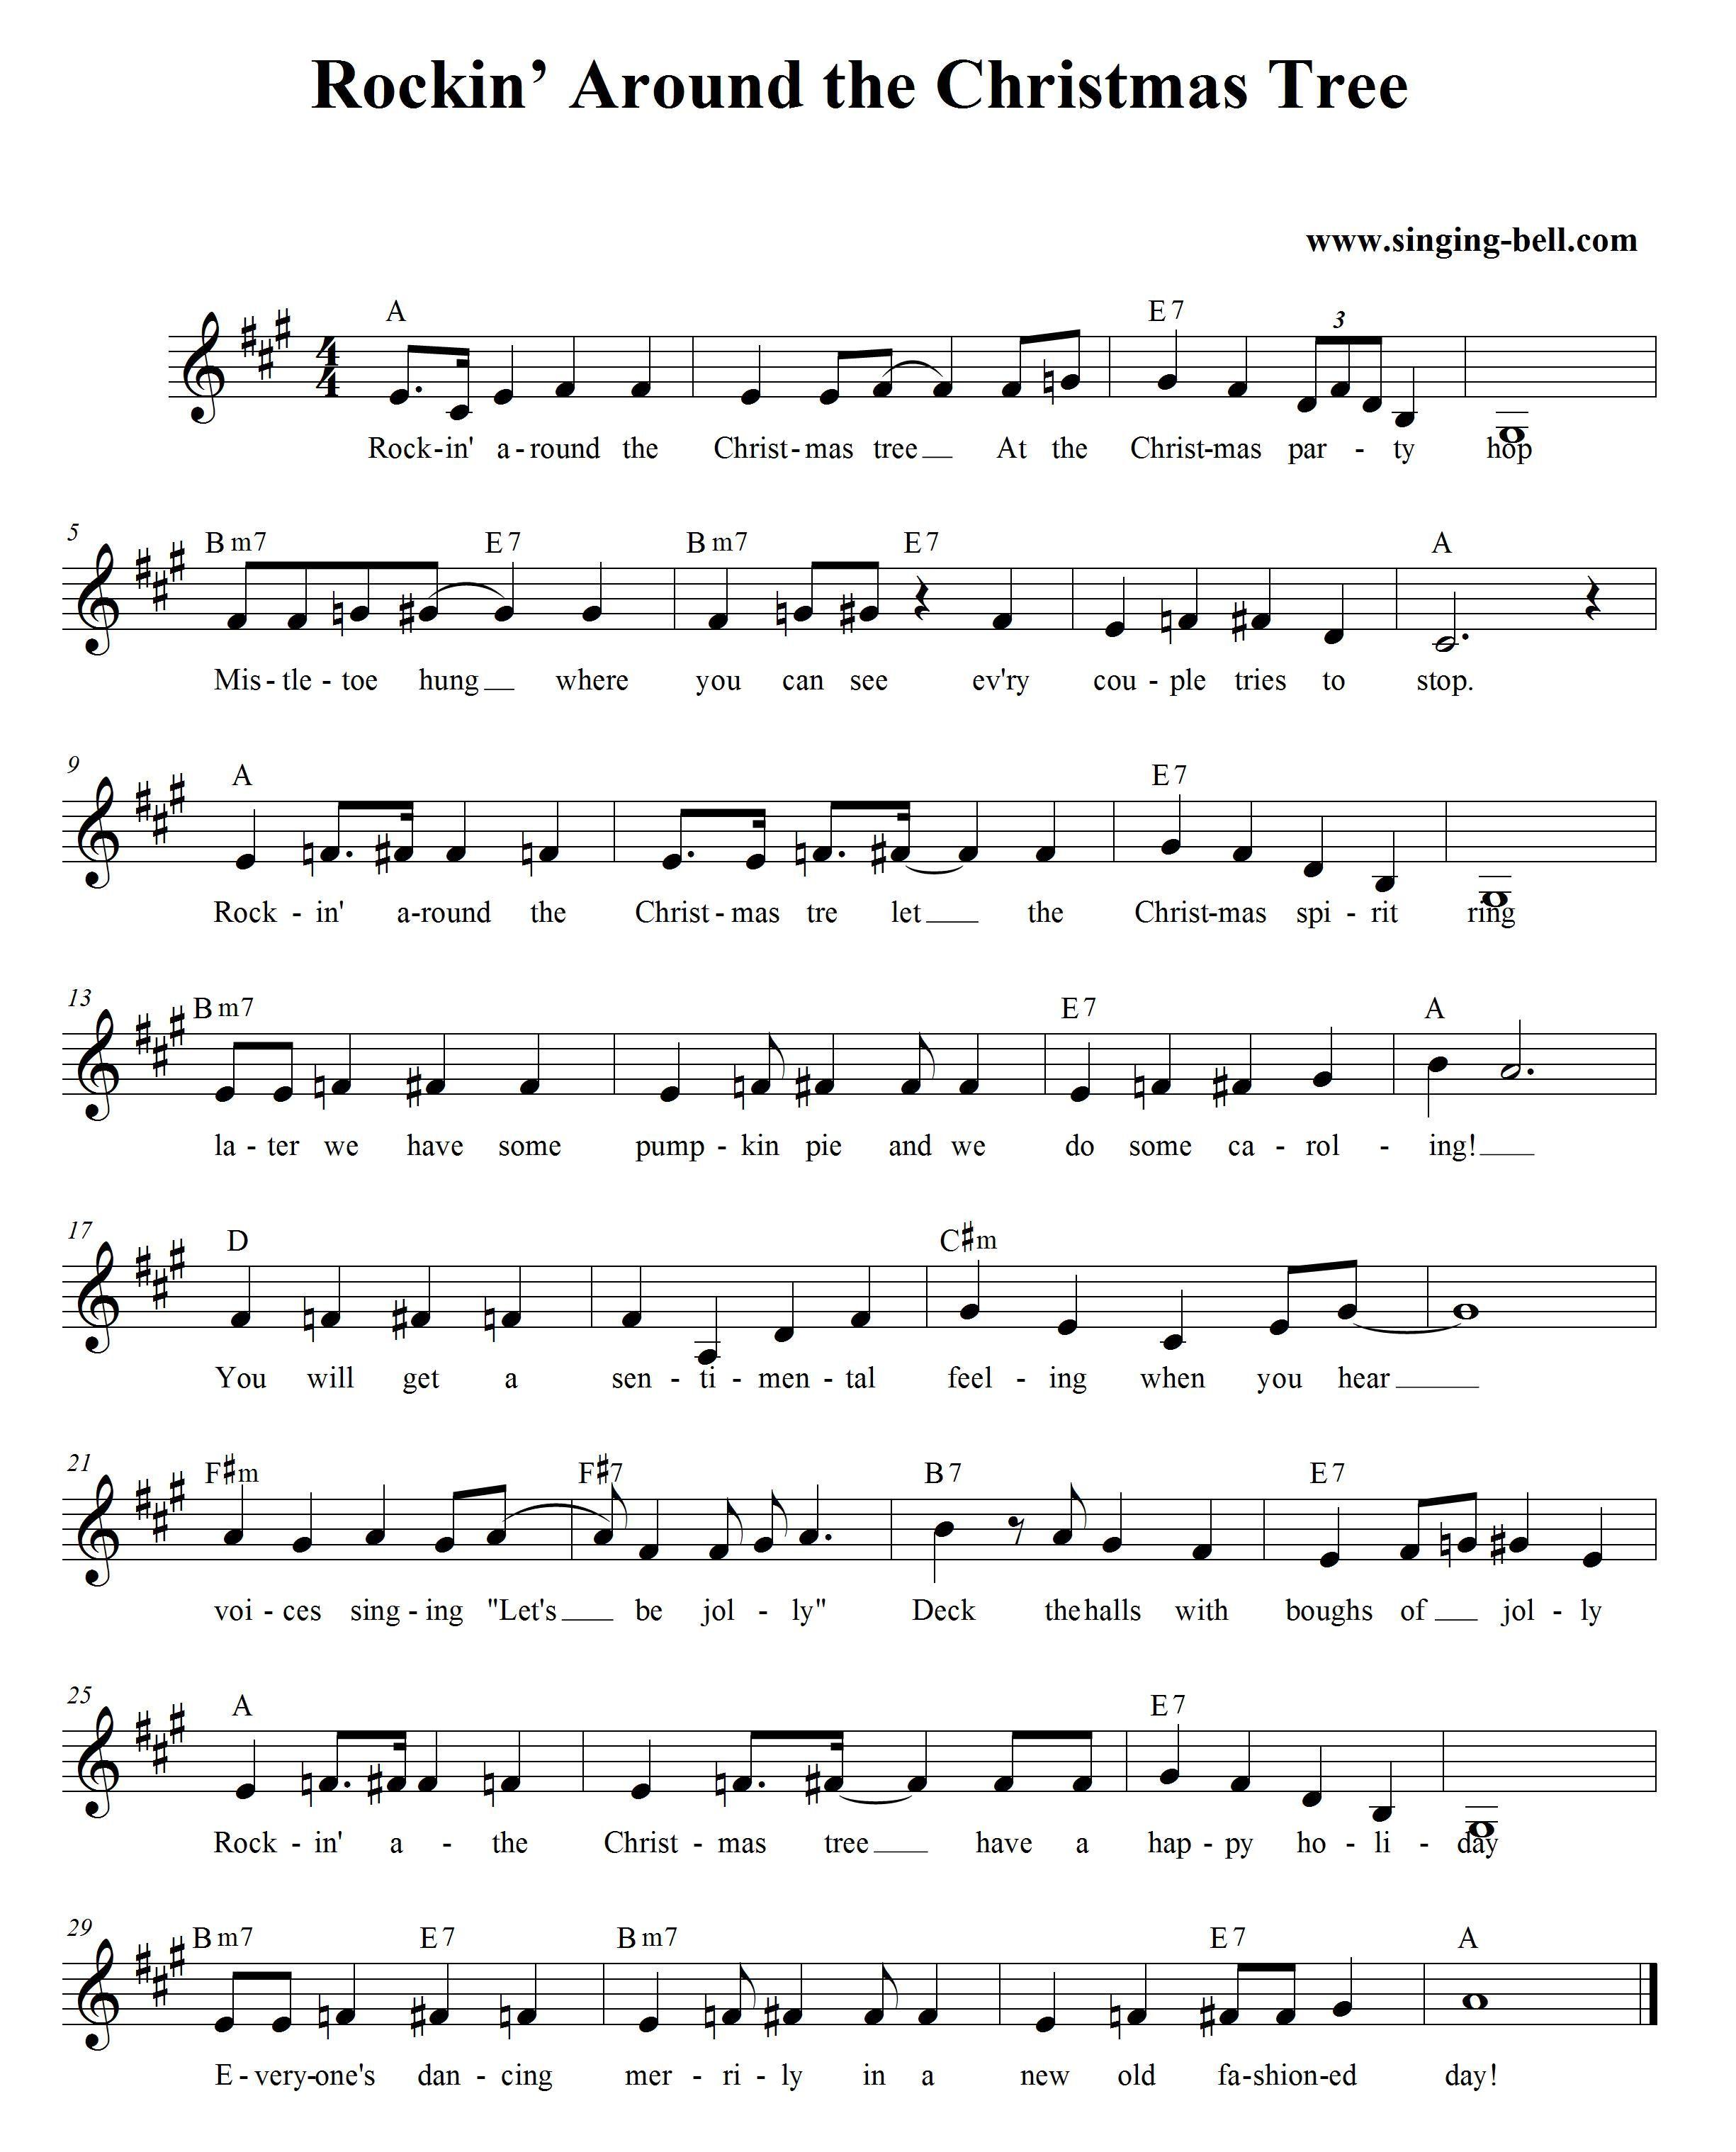 Rocking Around The Christmas Tree Boomwhackers 01 Musikunterricht Musik Lied